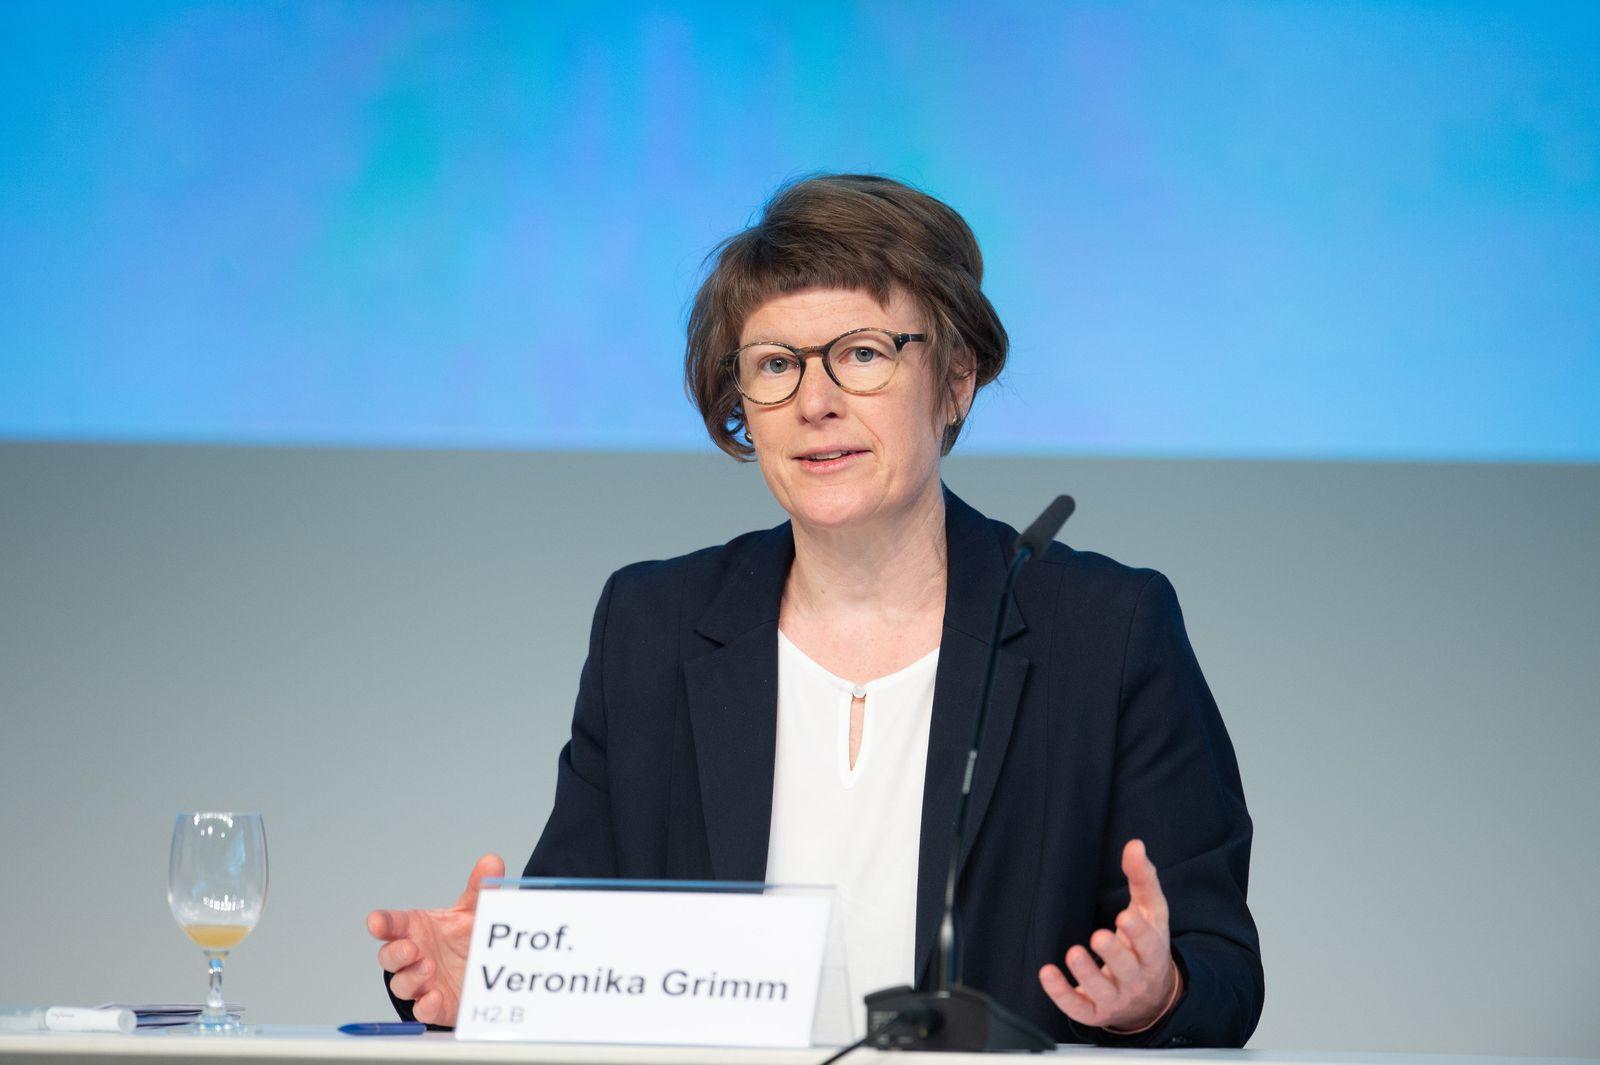 Veronika Grimm